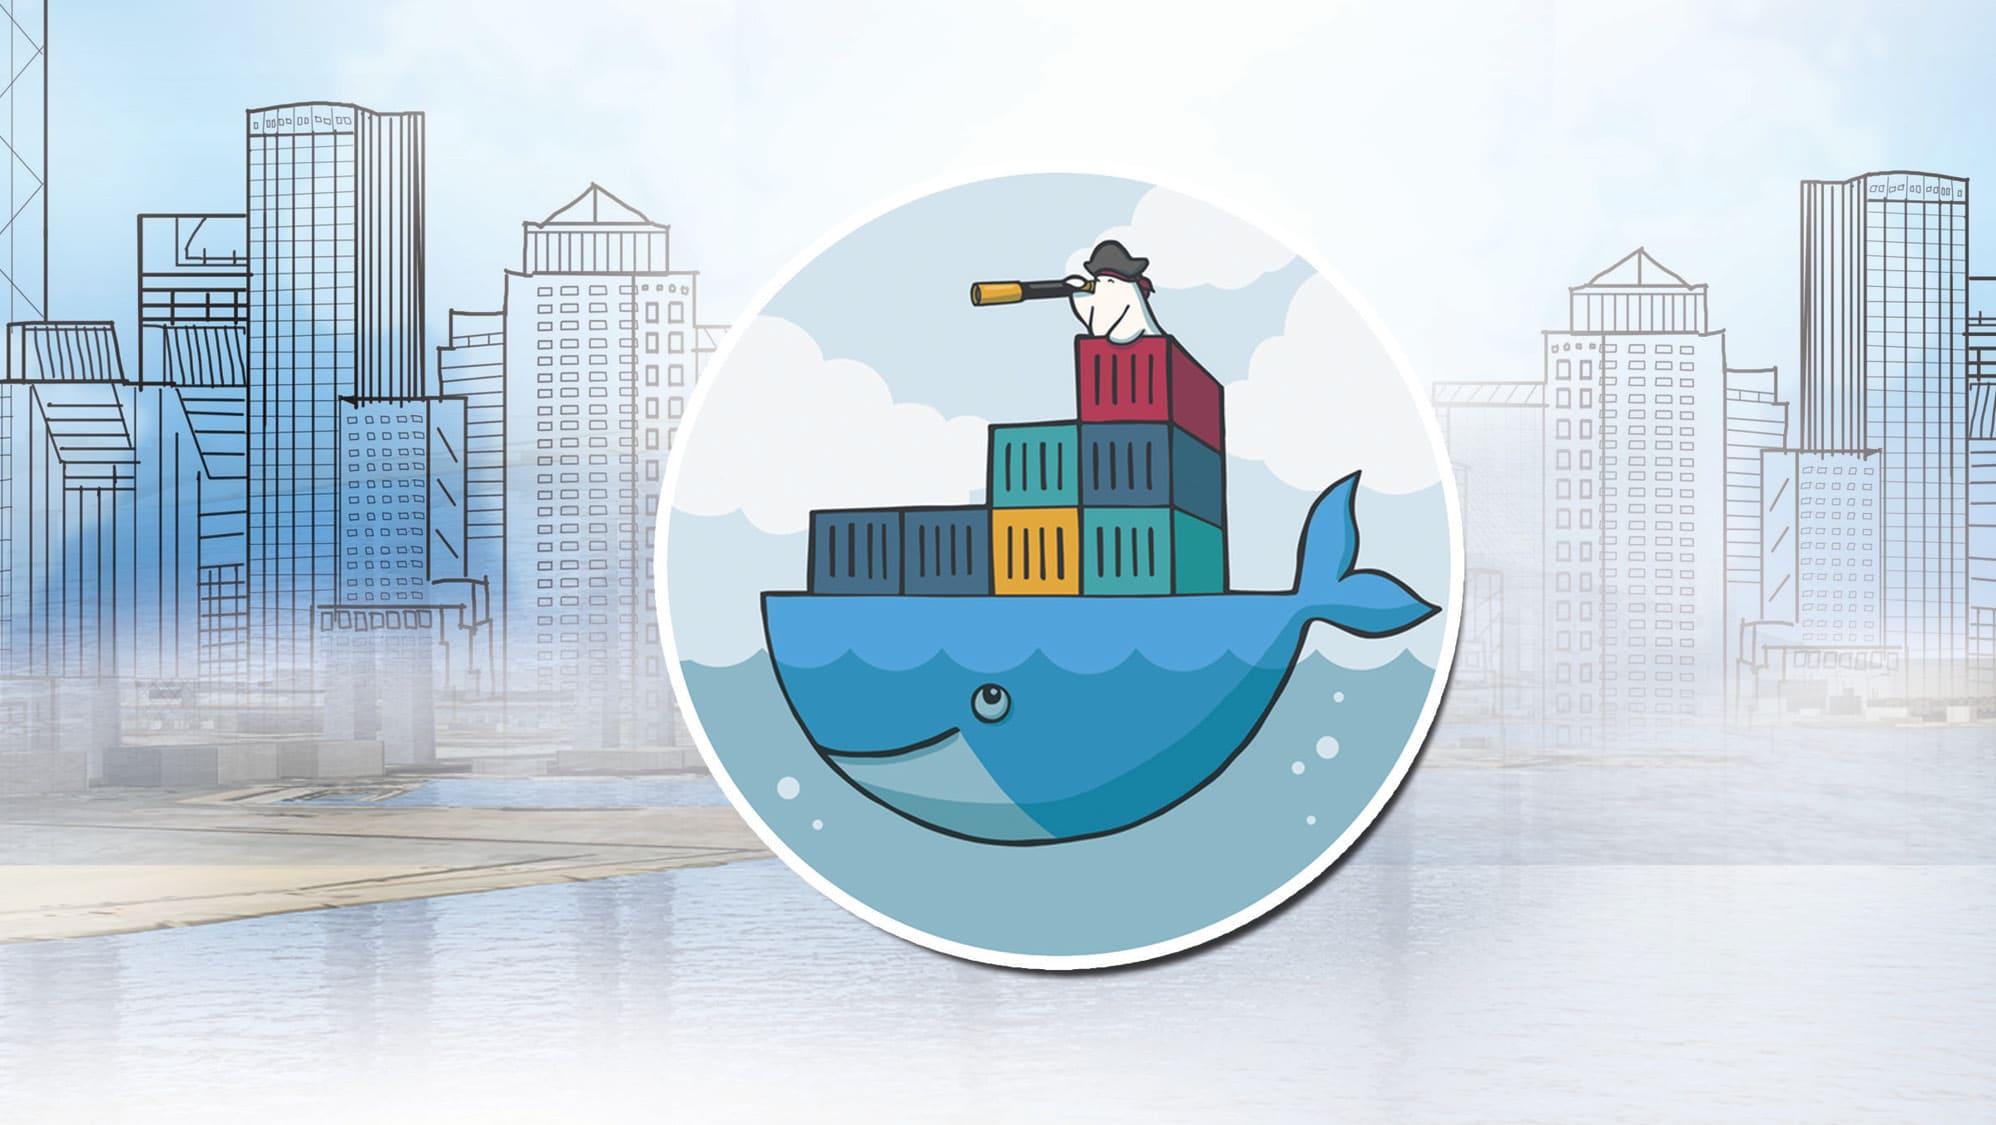 Accenture Docker partnership